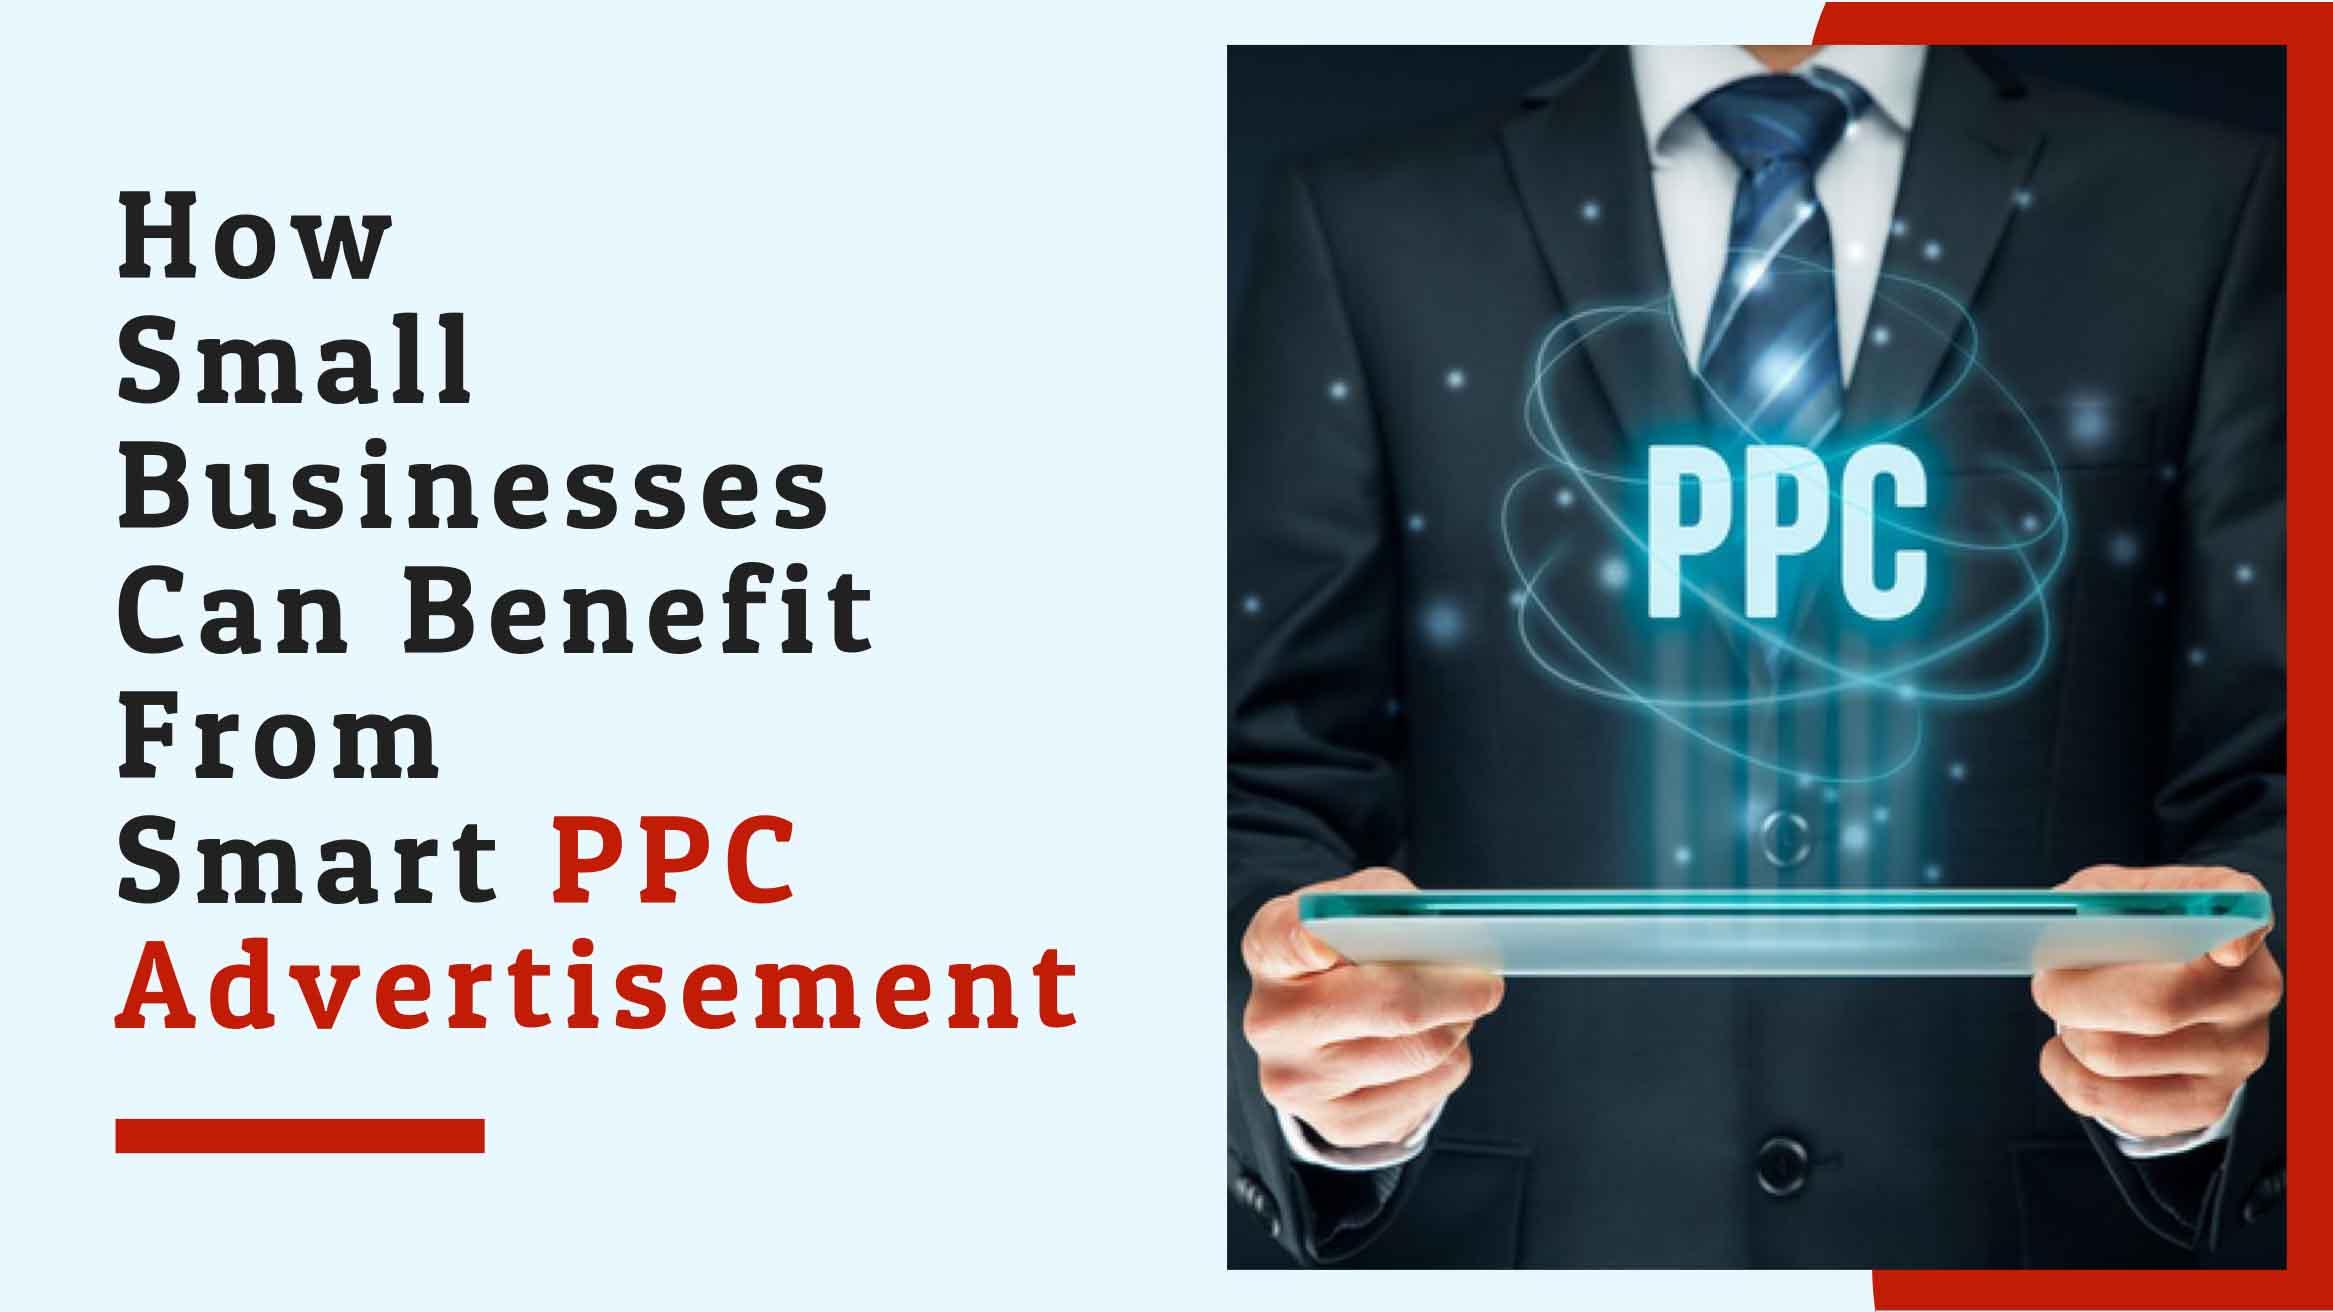 Smart PPC Advertisement by Freelancers Hub